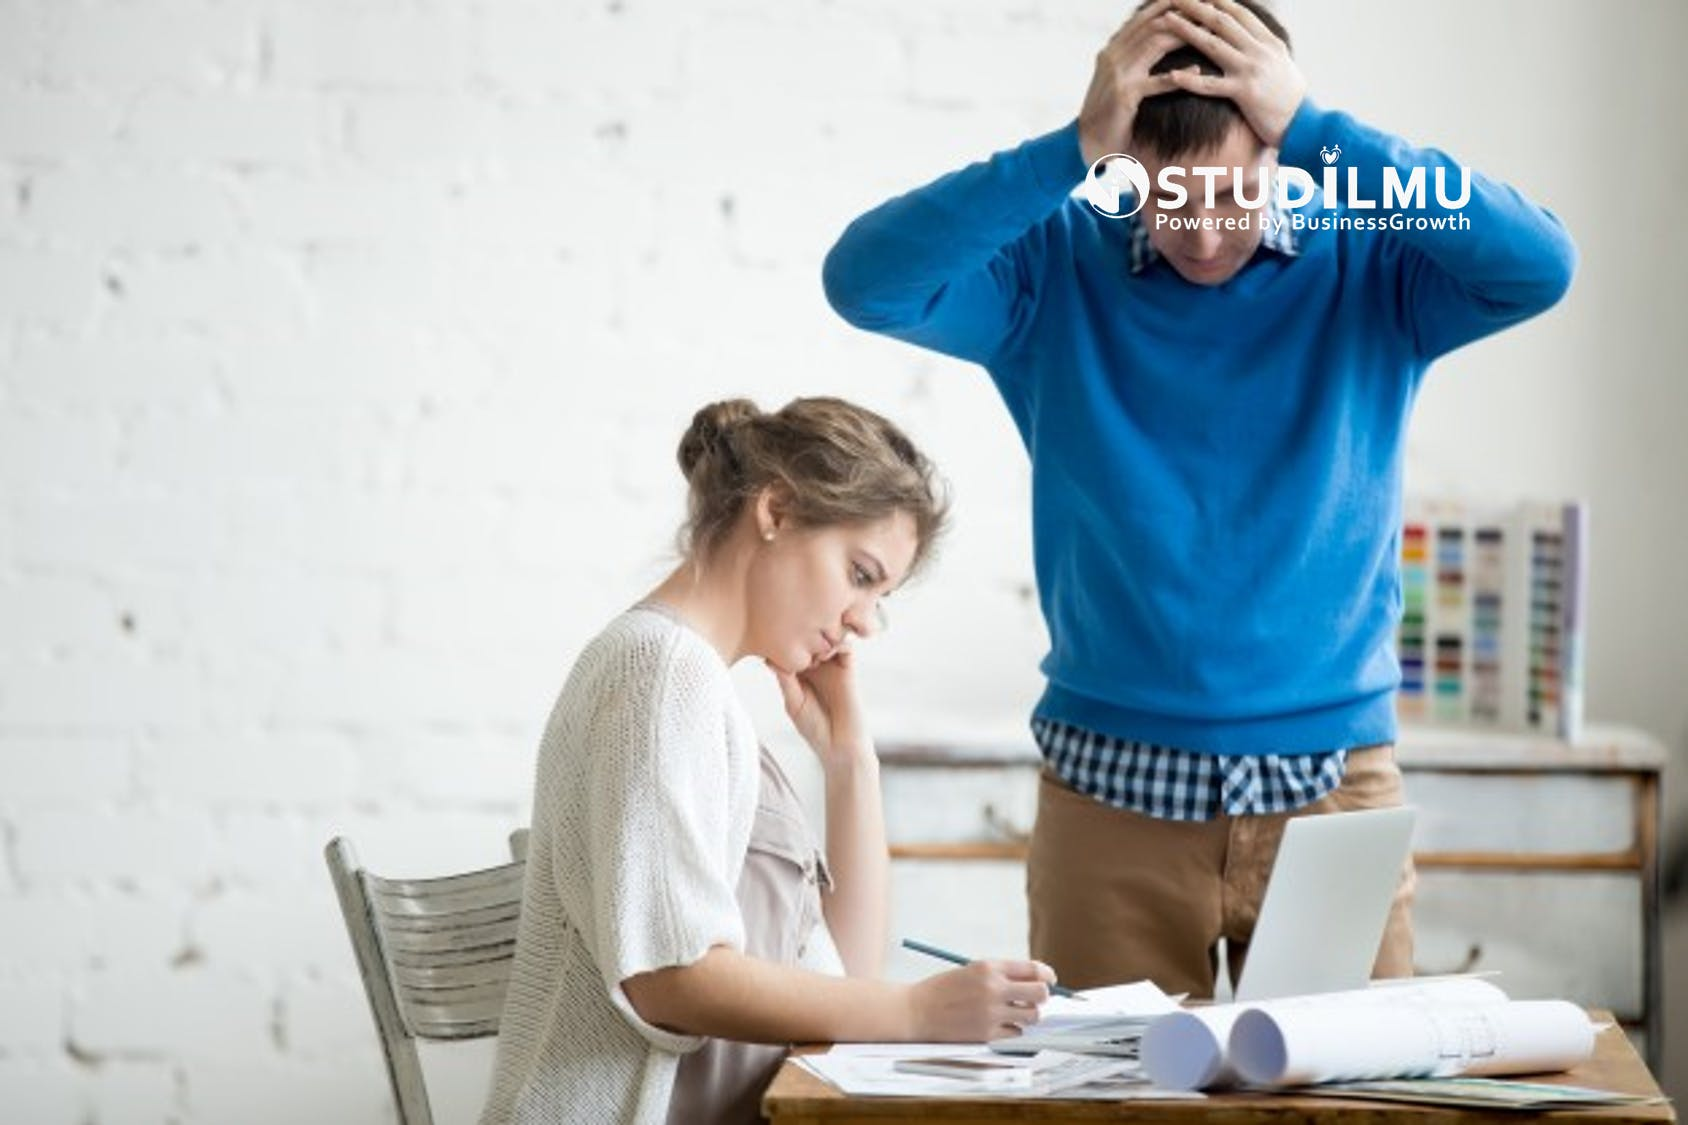 STUDILMU Career Advice - Apa Itu Kecerdasan Emosional?